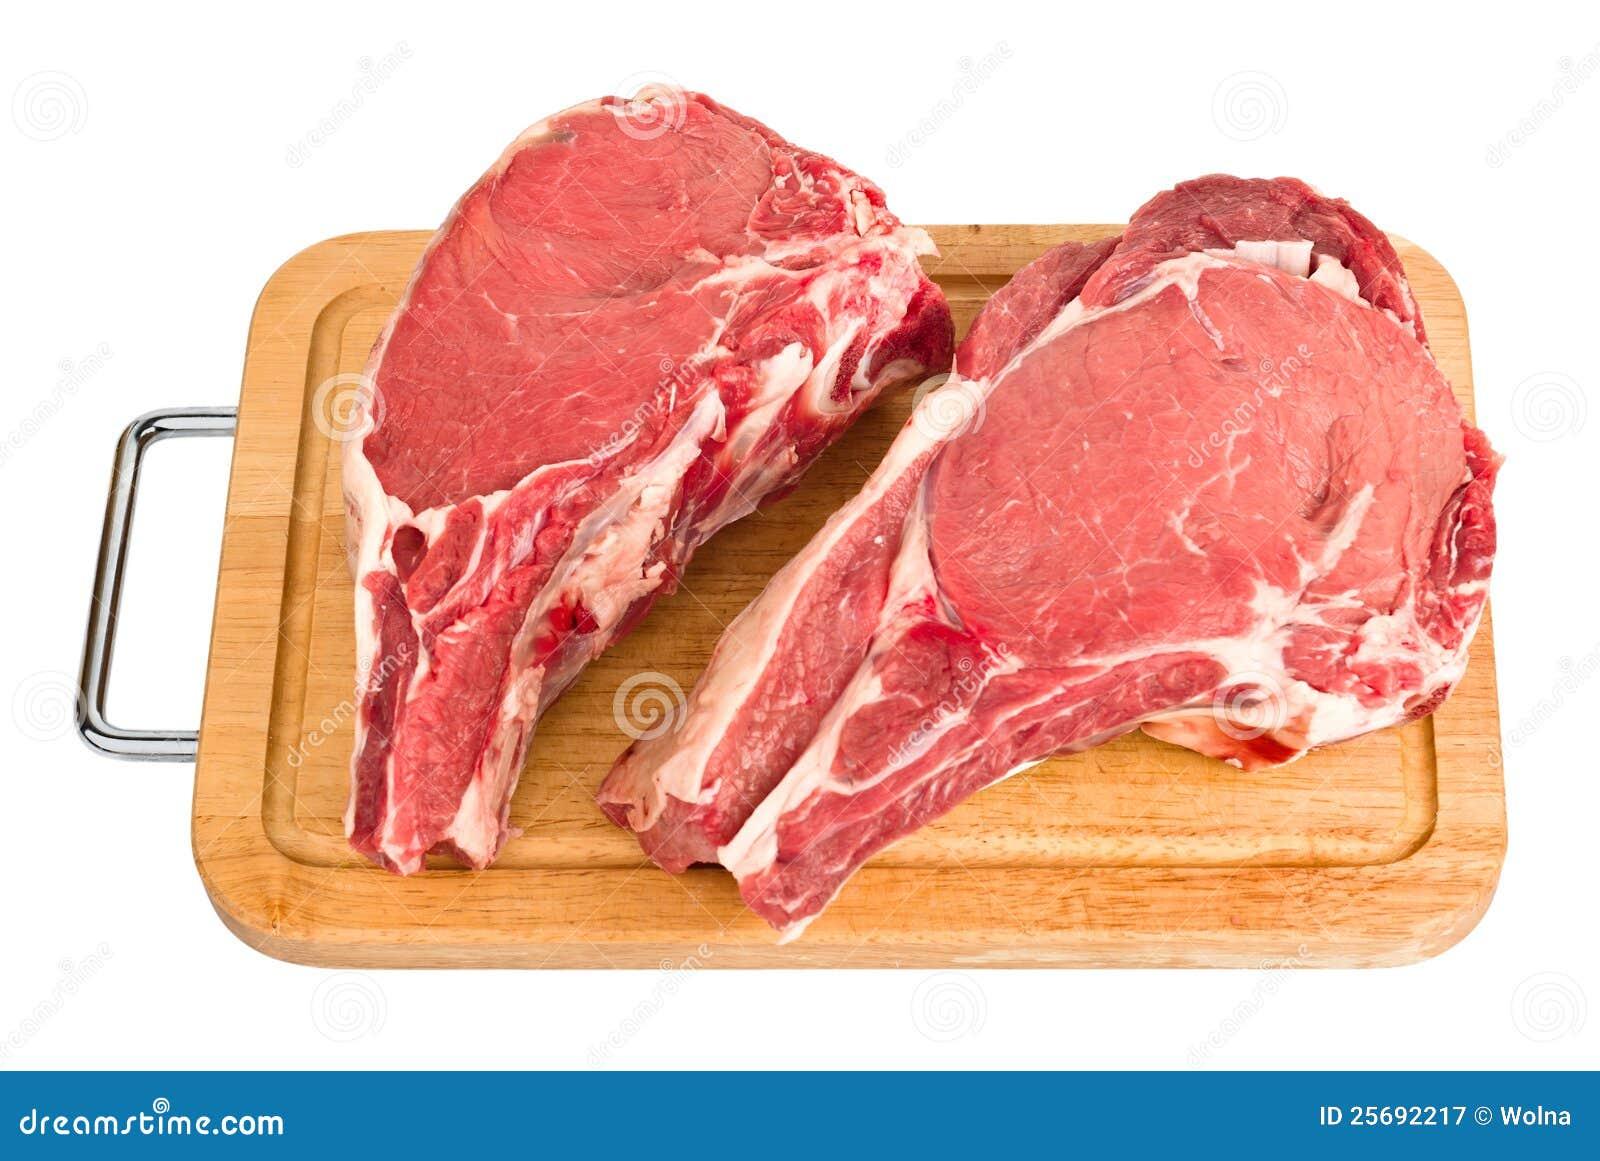 Rå isolerad meat